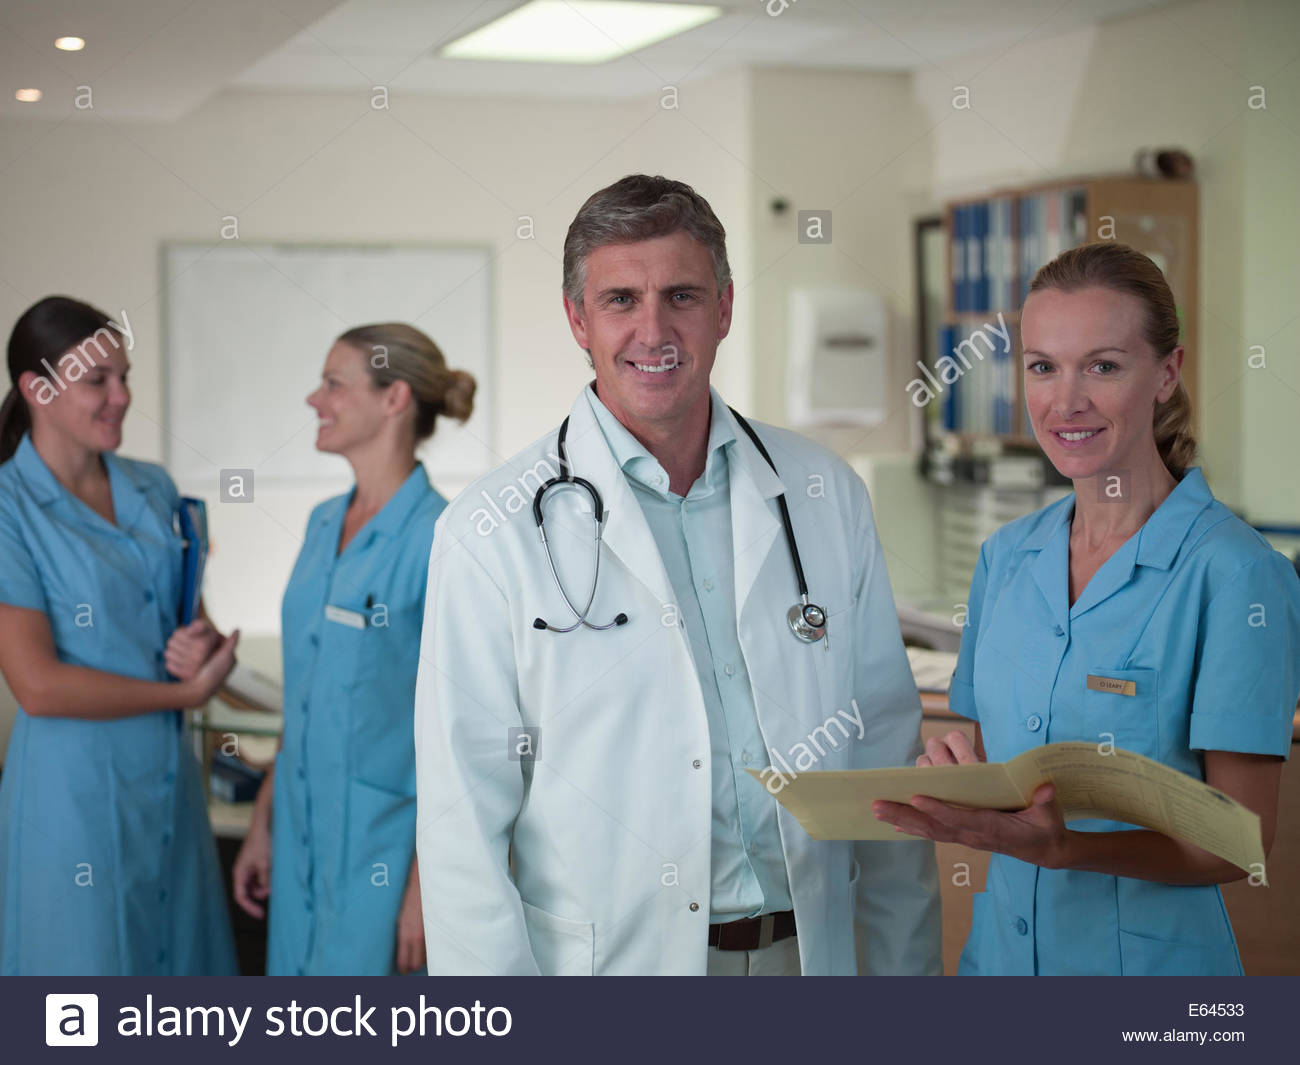 Médecin et l'infirmière de l'examen medical chart Photo Stock